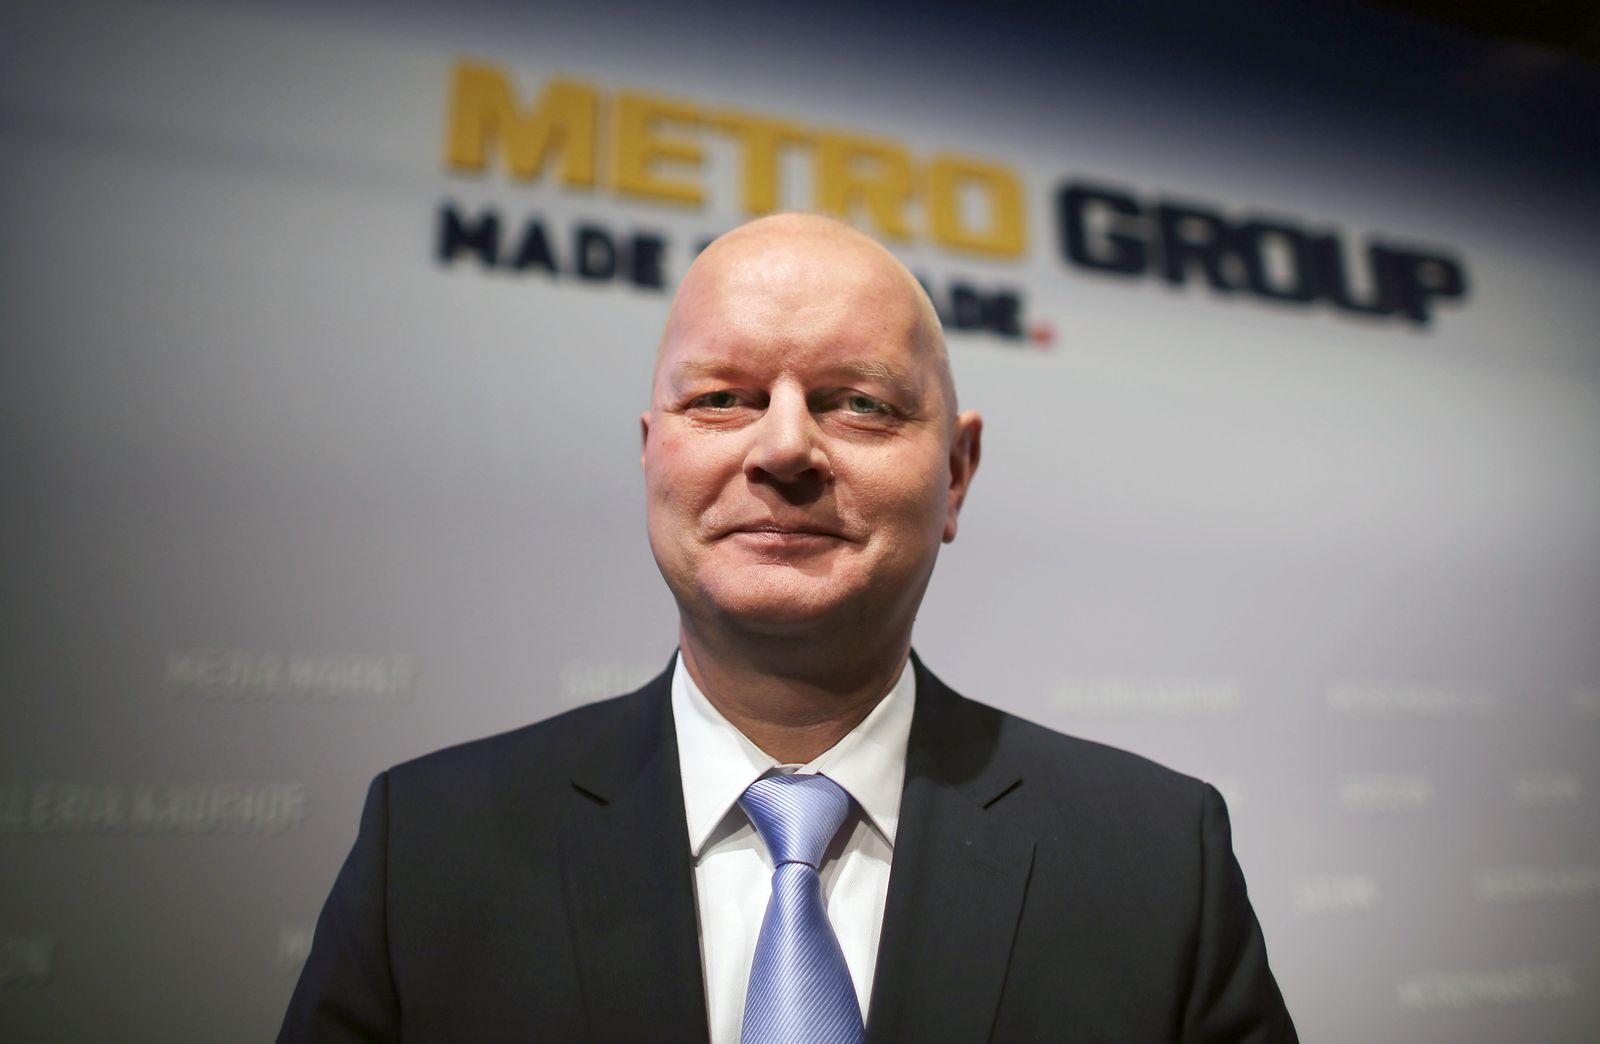 Metro - Olaf Koch